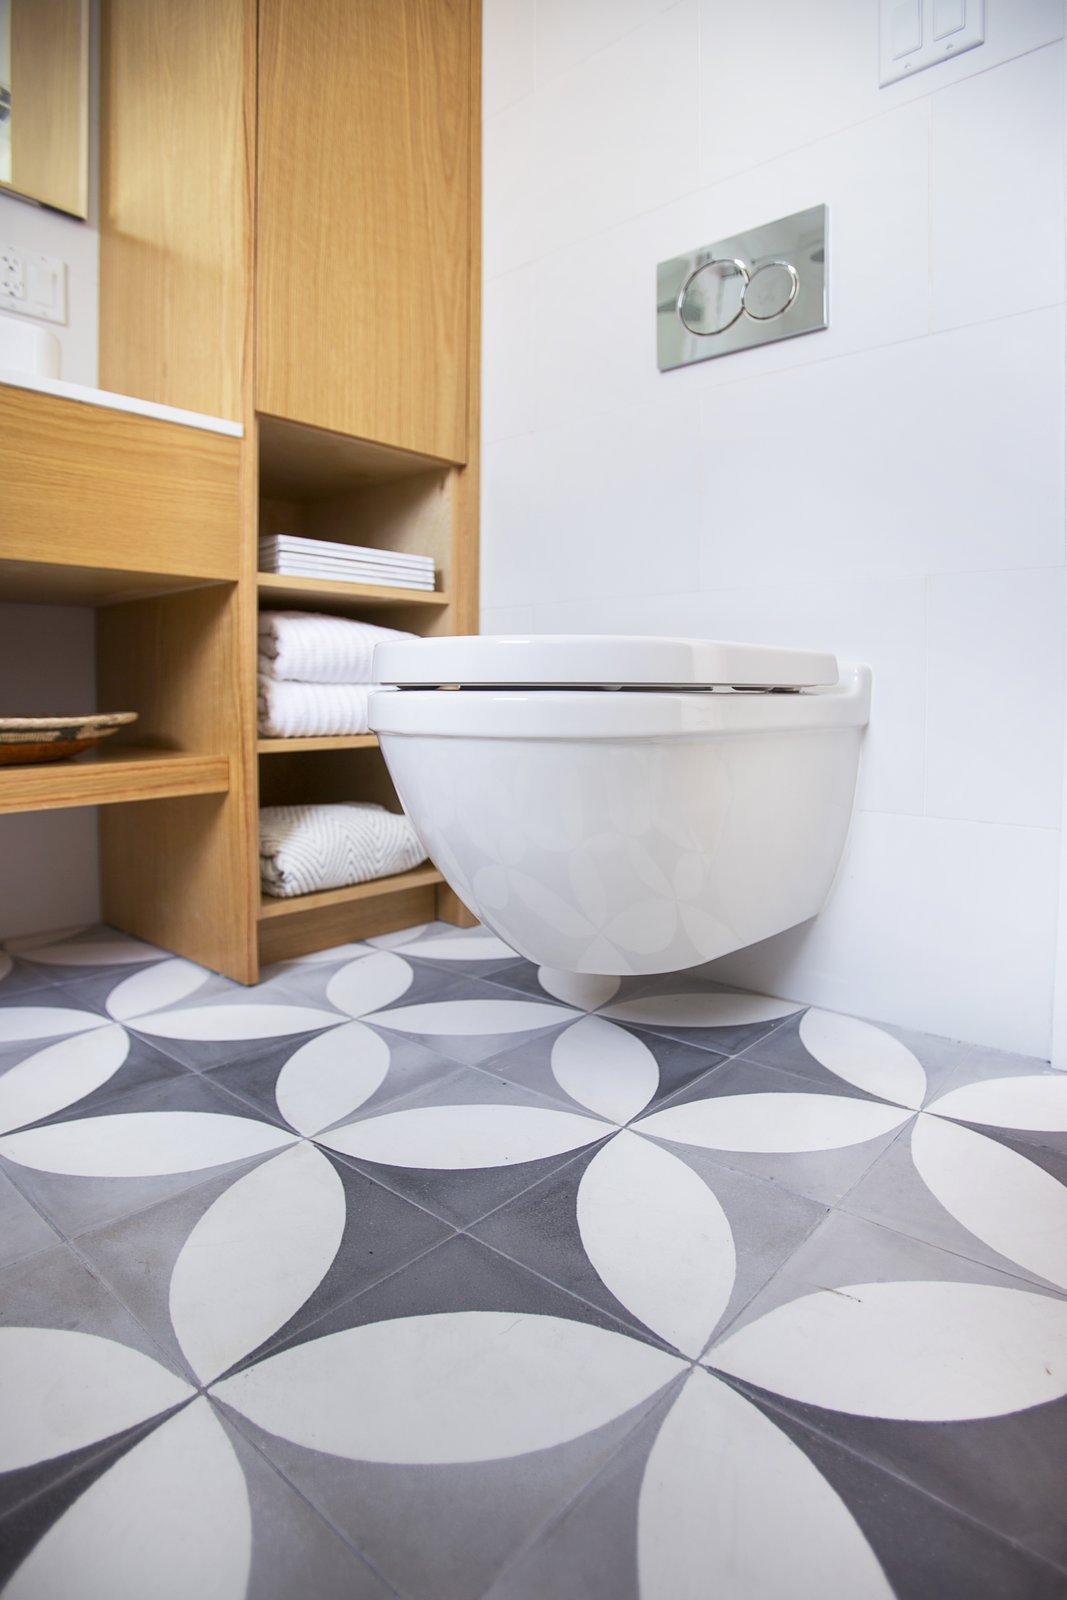 Bath Room, Engineered Quartz Counter, Concrete Floor, One Piece Toilet, Vessel Sink, and Ceramic Tile Wall  Silverlake on Riverside Terrace